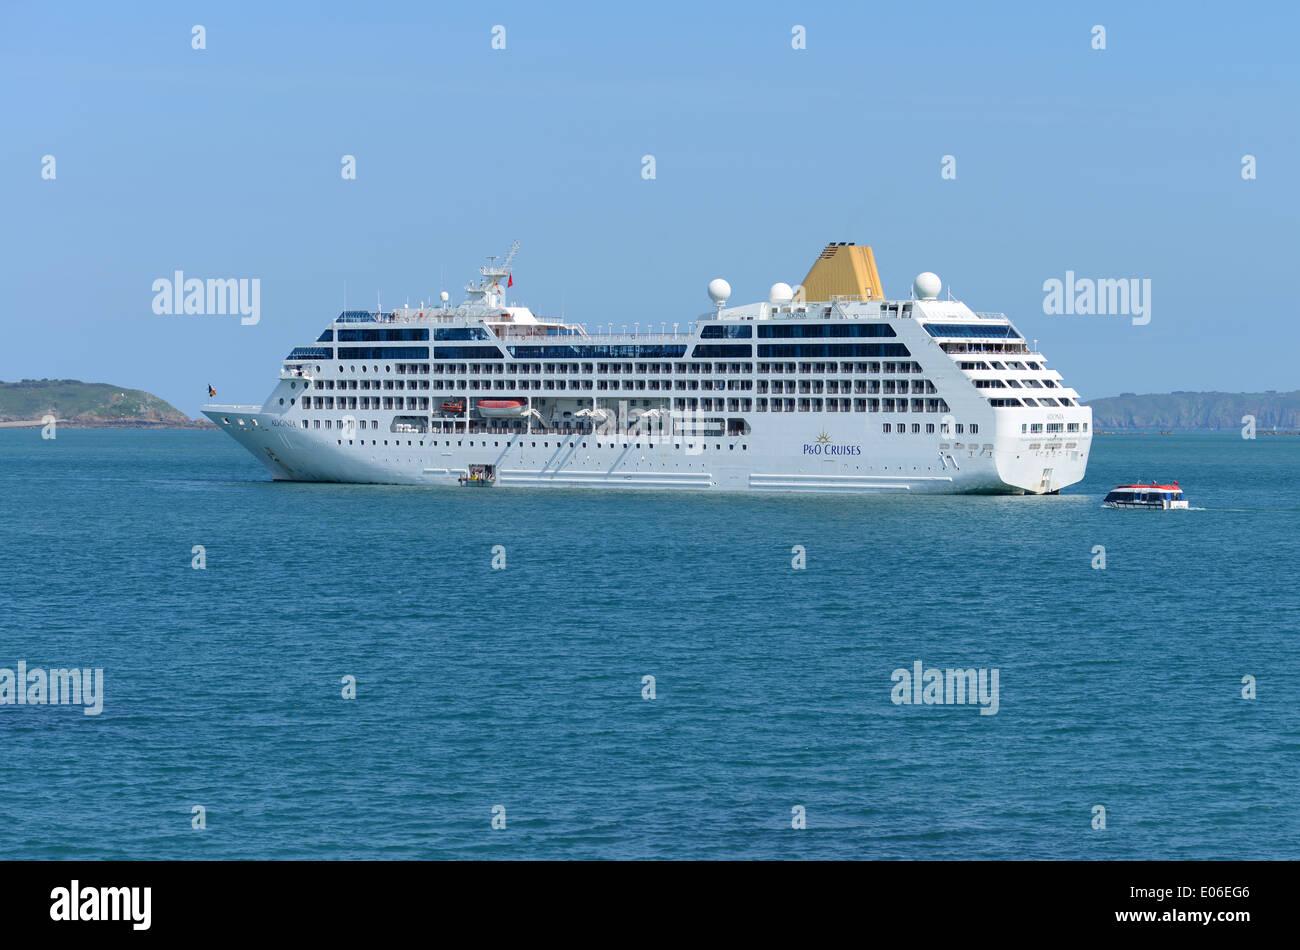 P O Cruise Ship Adonia Moored Off The Coast Of St Peter Port - P and o cruises ships